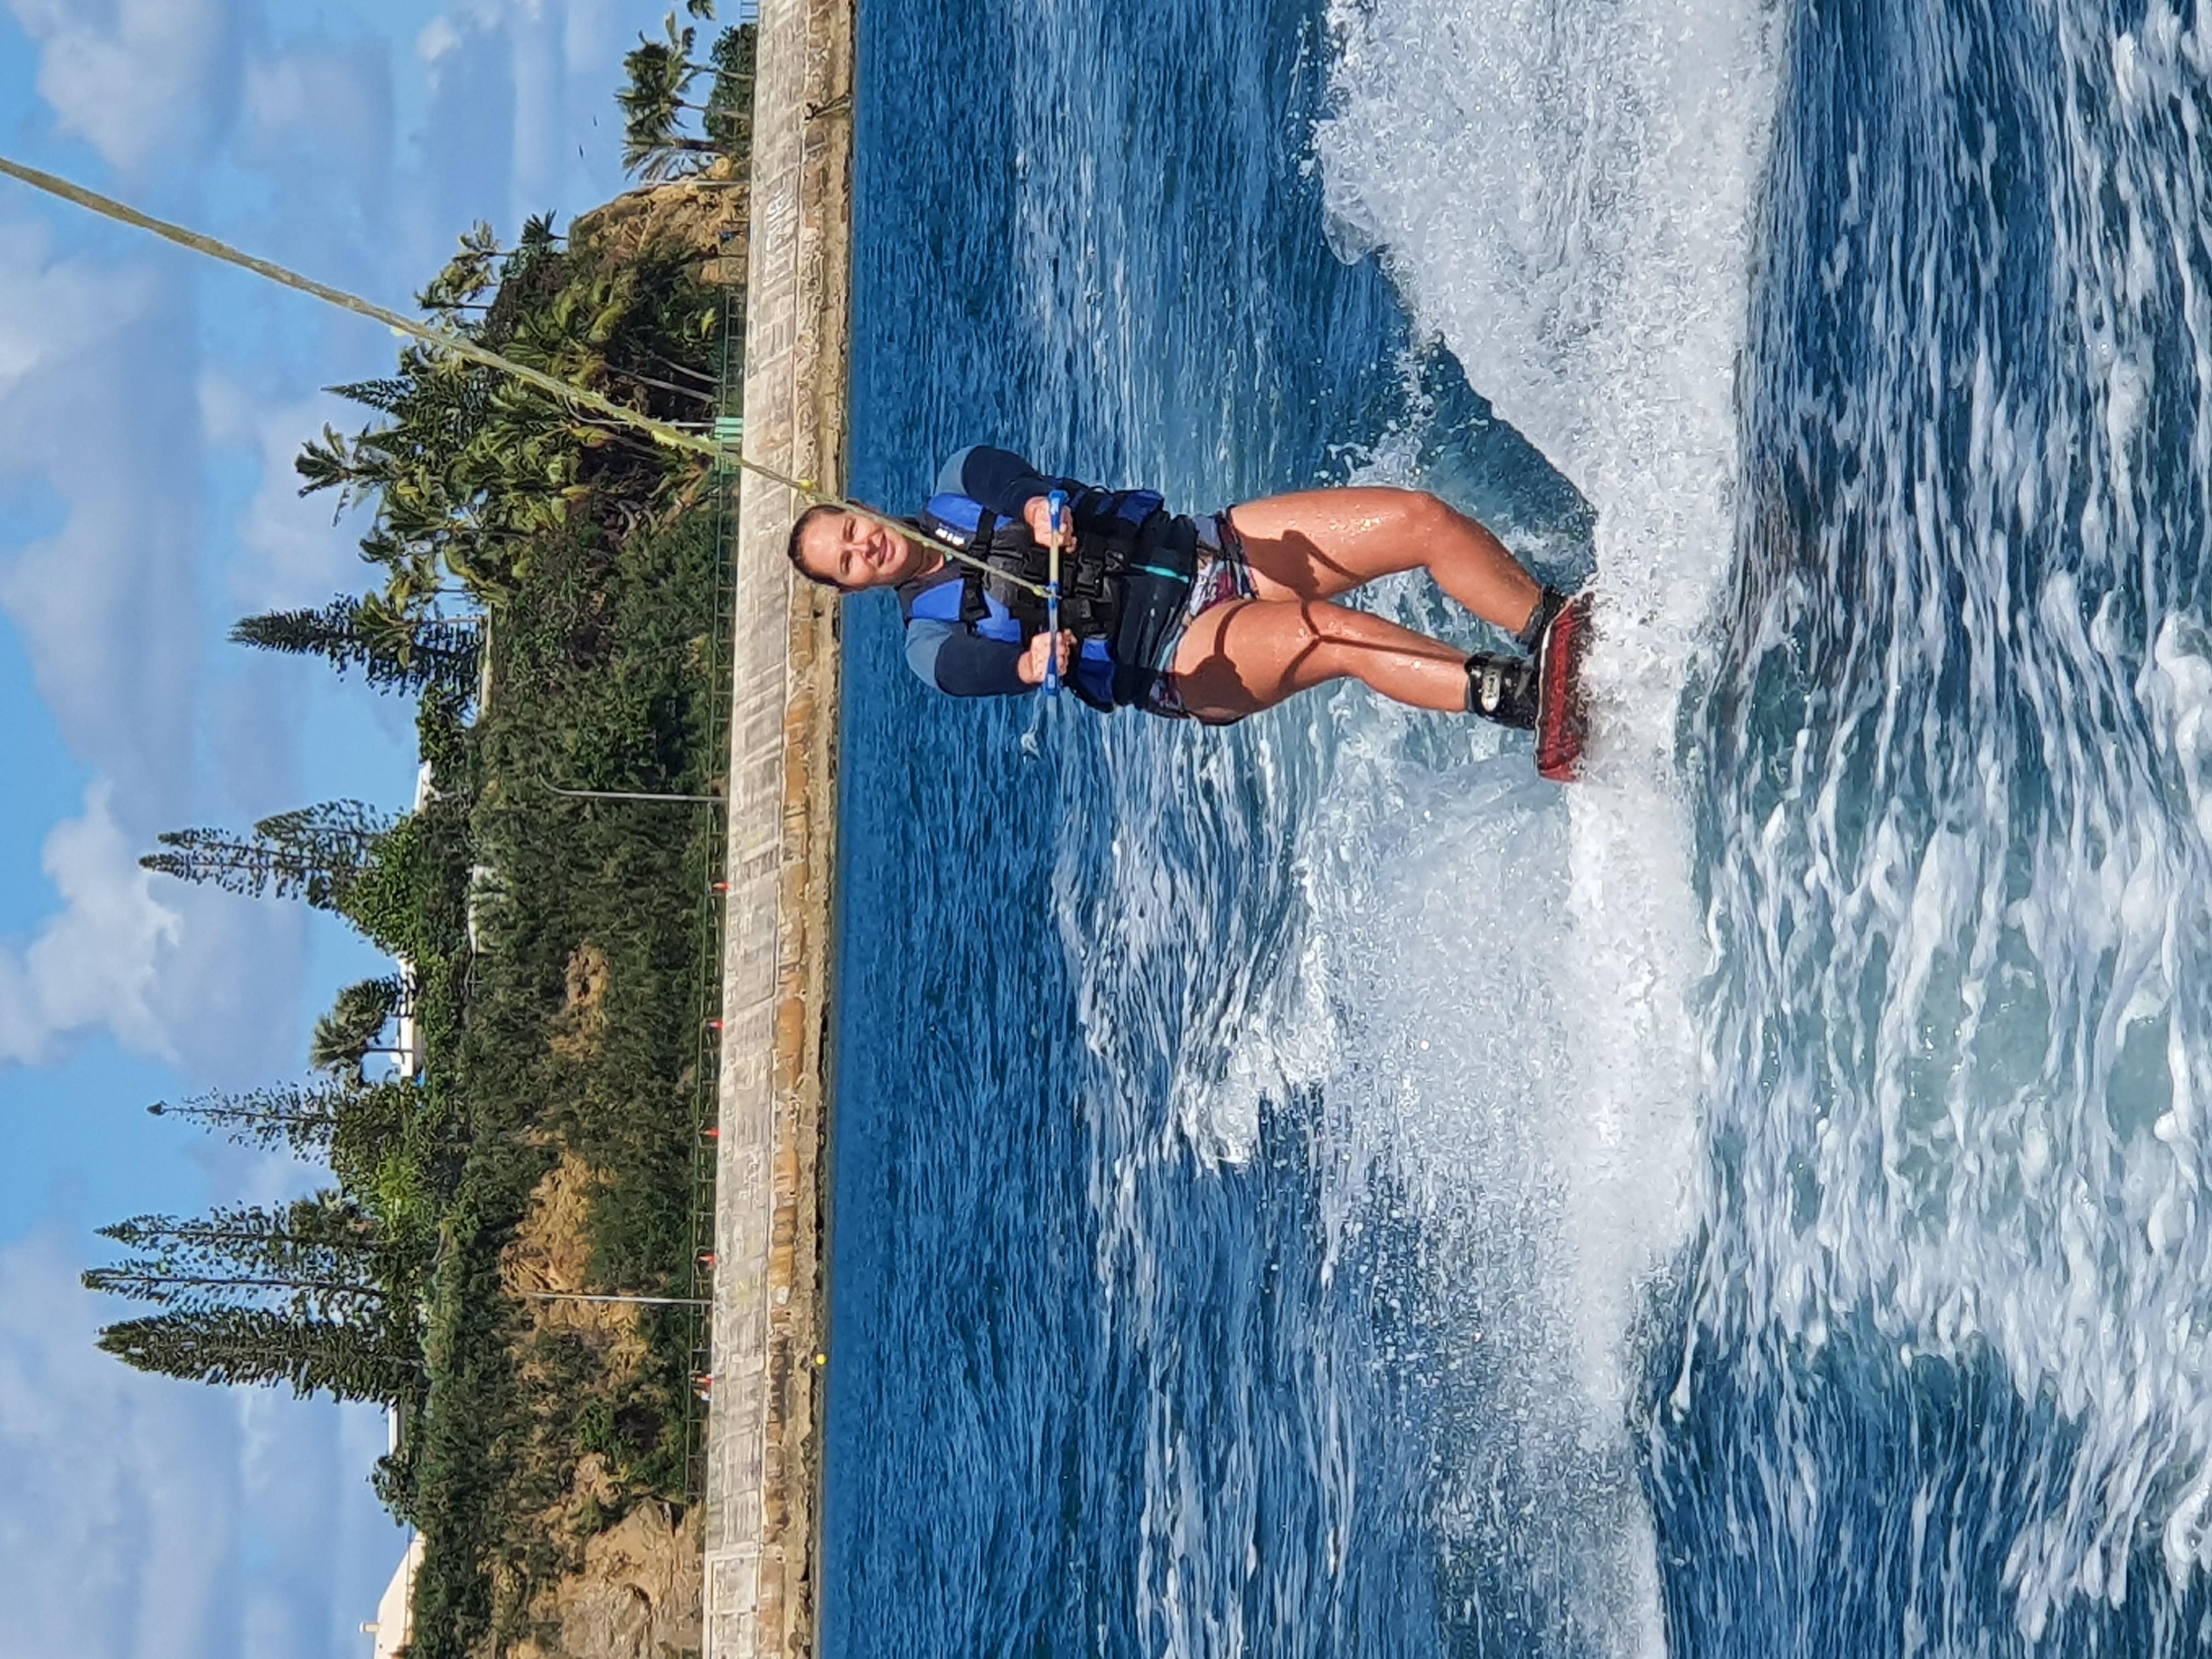 wakeboard 3